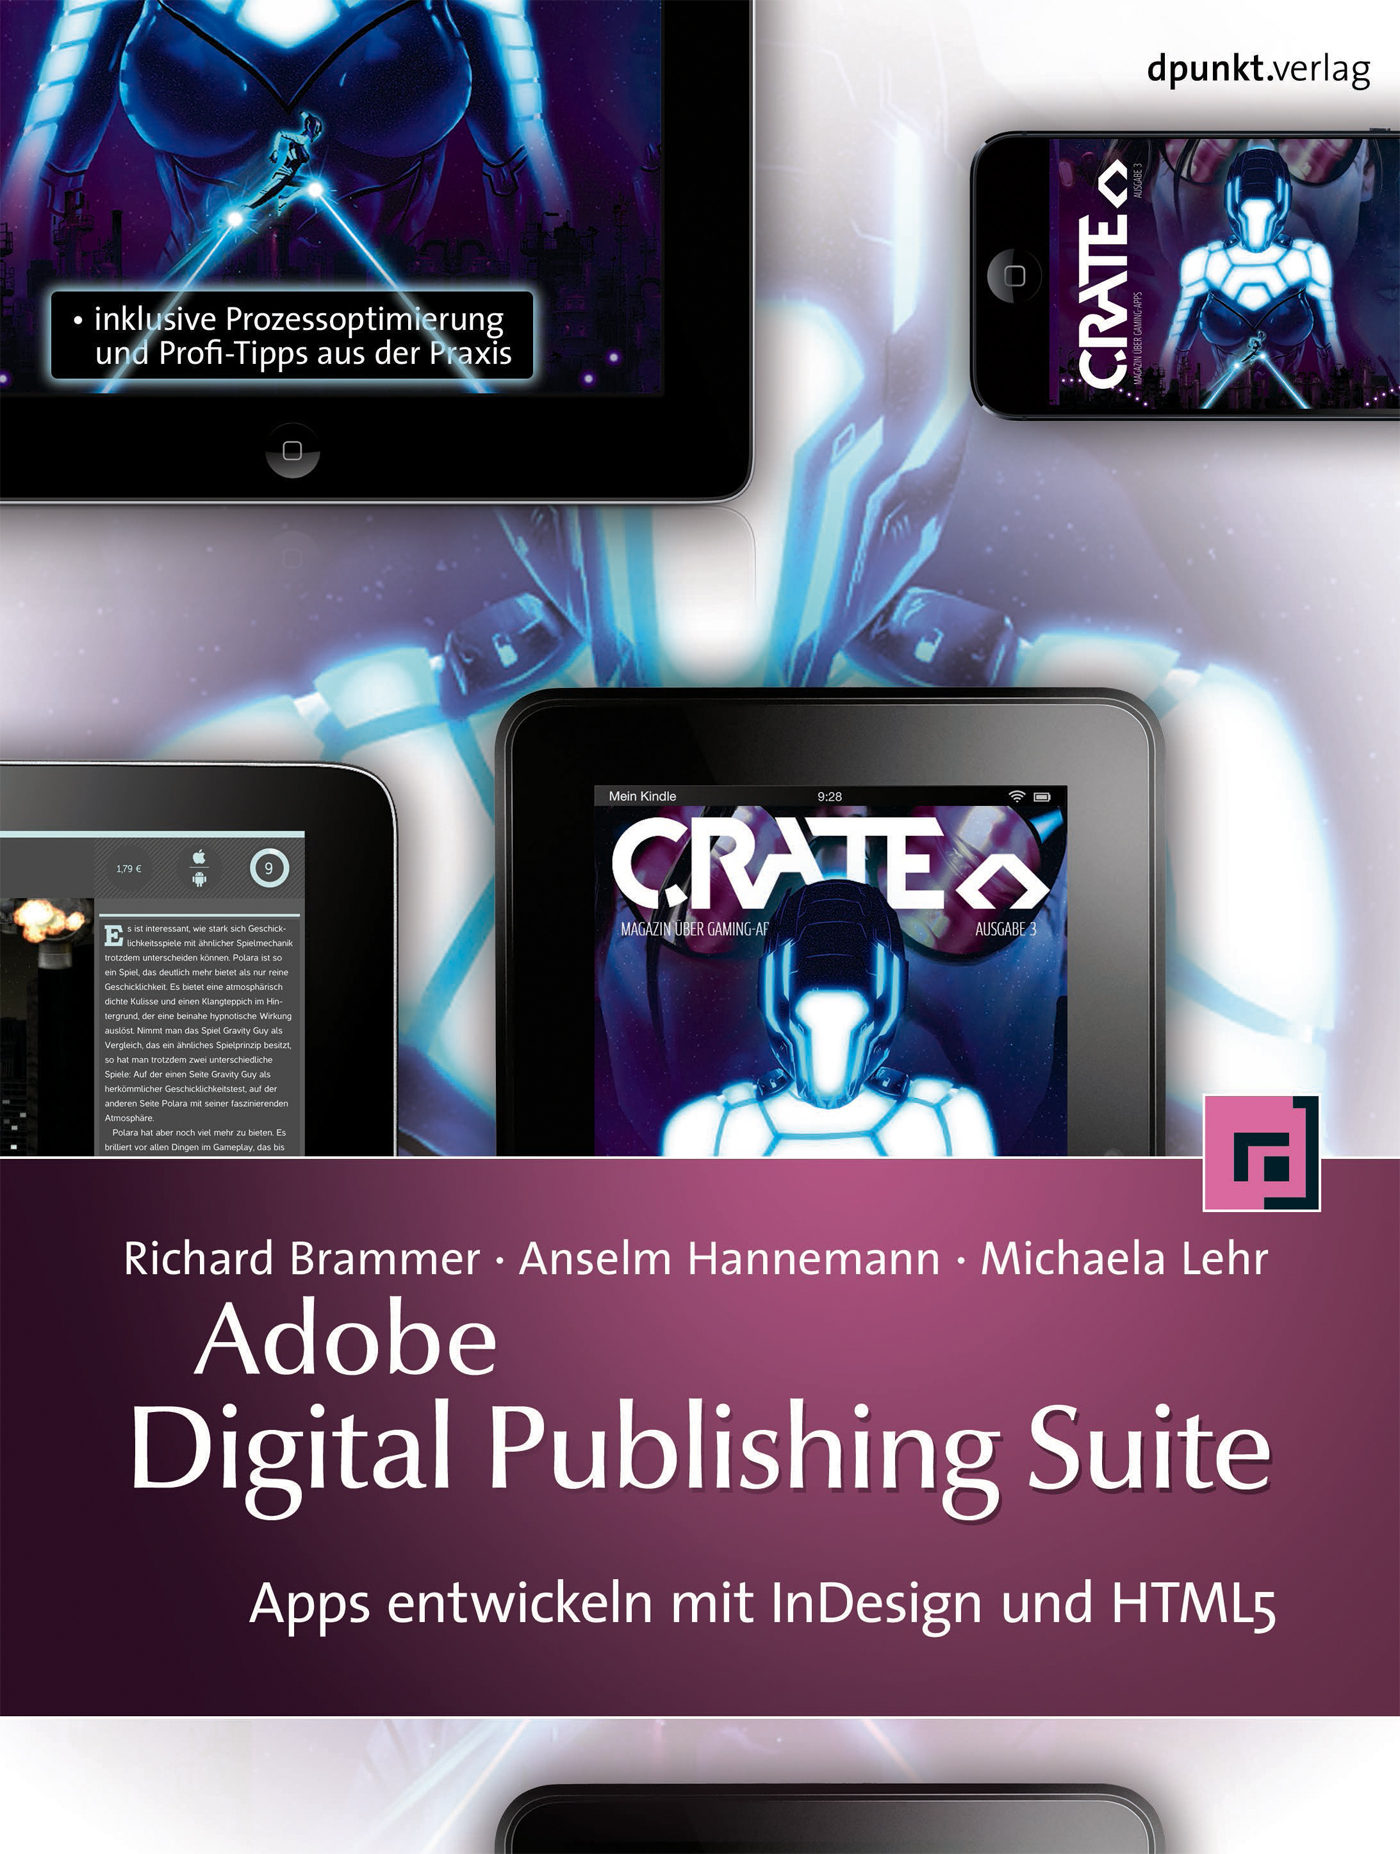 Adobe Digital Publishing Suite Ebook Ebooks El Corte